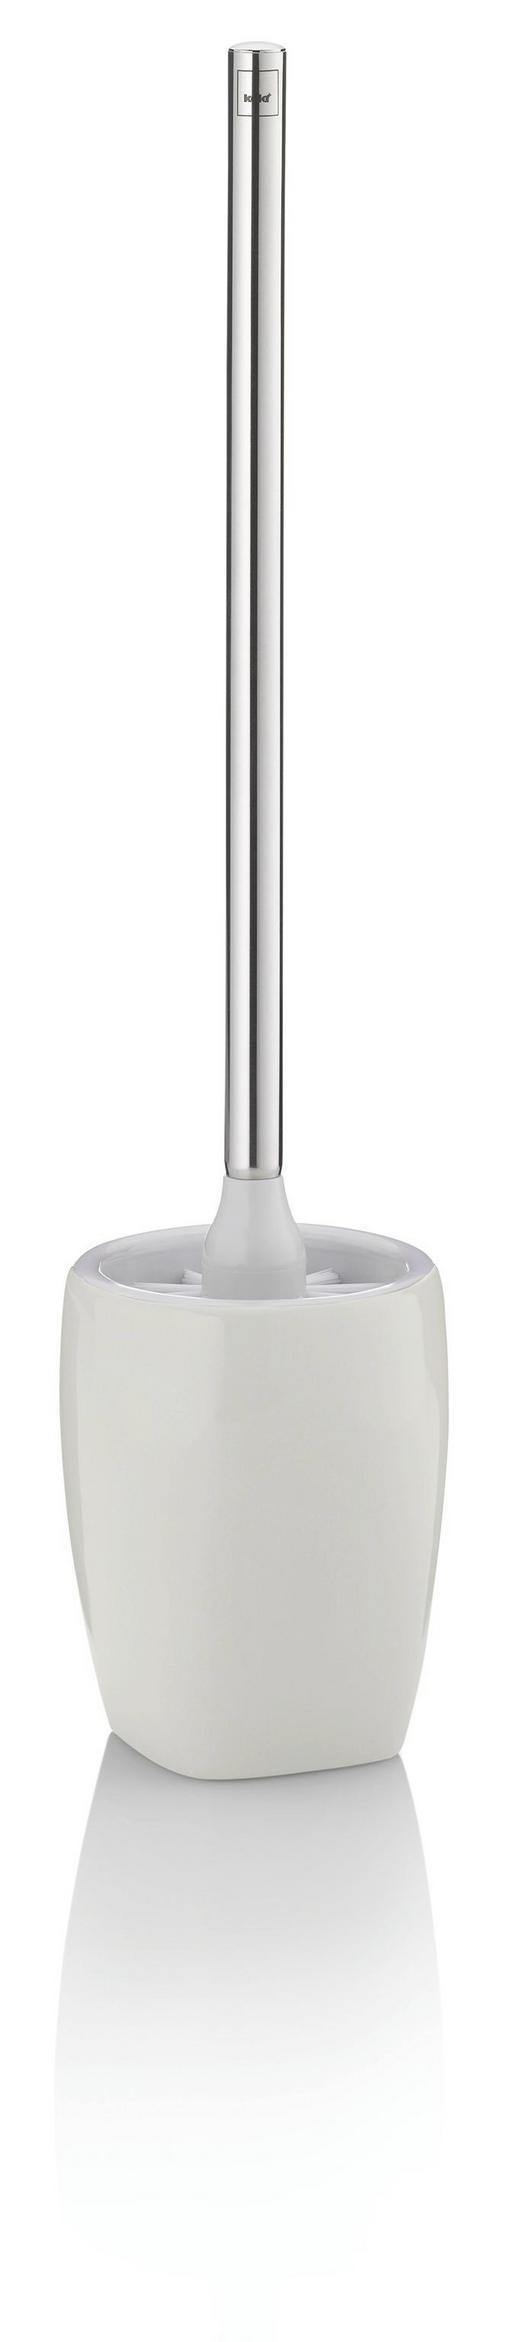 WC-BÜRSTENGARNITUR - Edelstahlfarben/Beige, KONVENTIONELL, Keramik/Kunststoff (12/12/45cm)